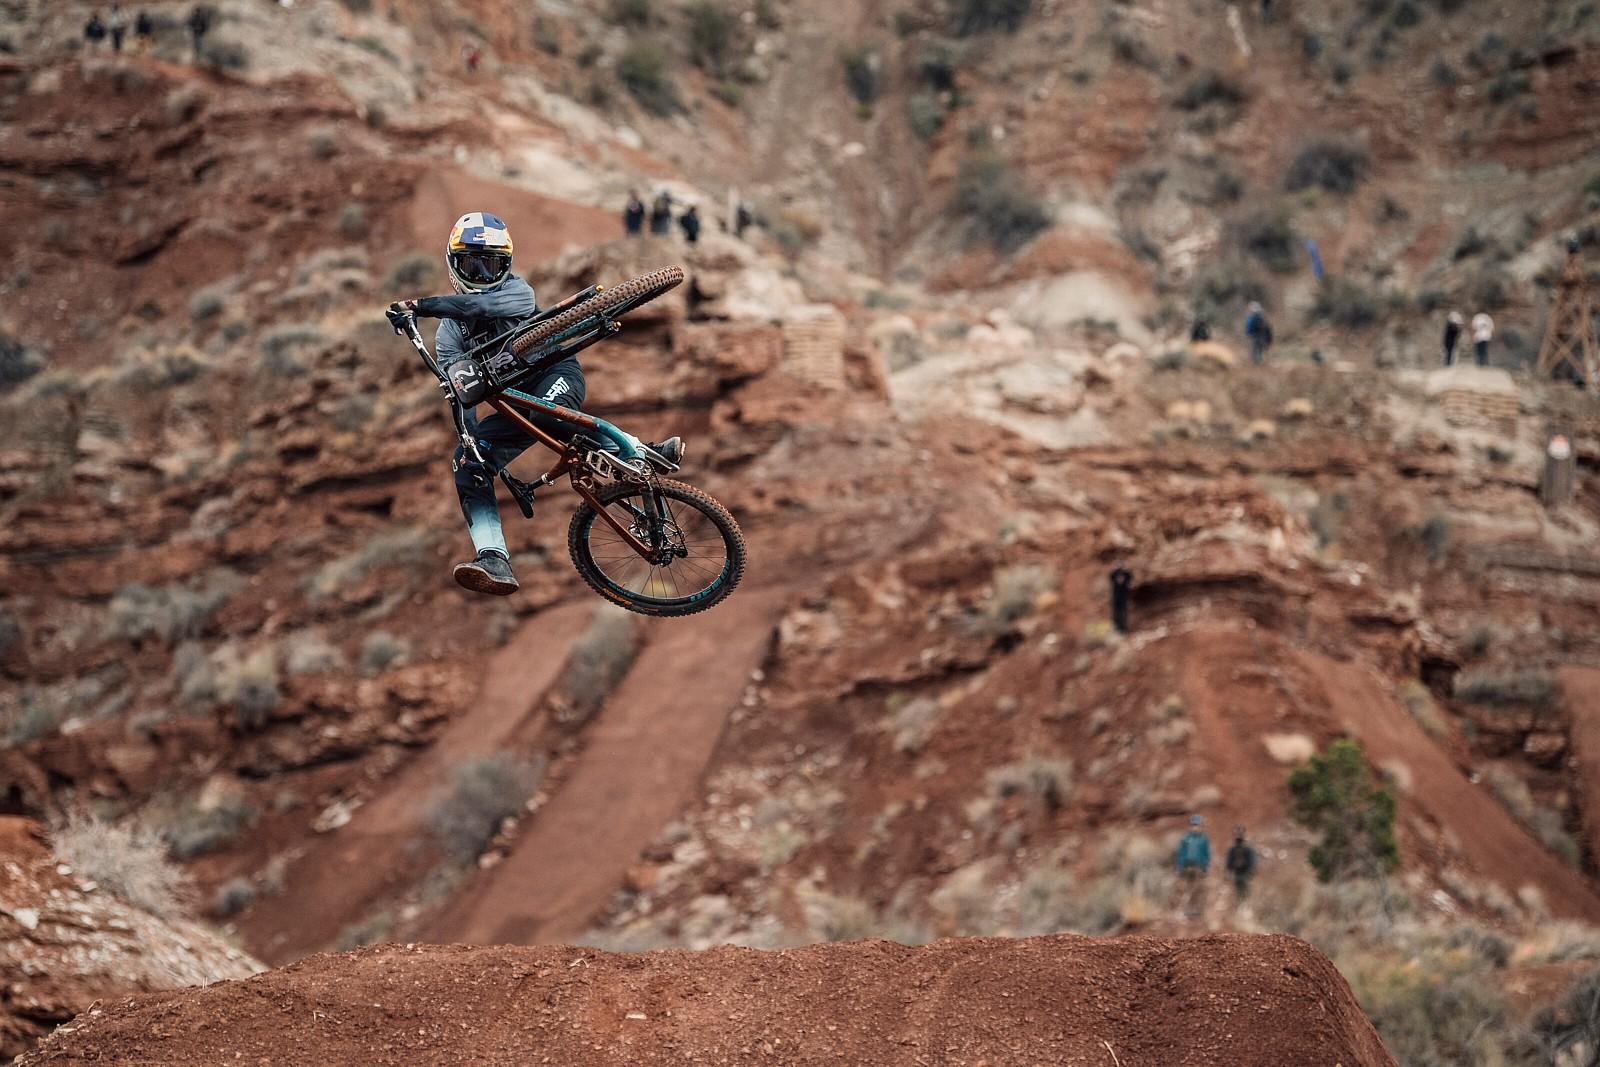 Szymon Godziek - 2021 Red Bull Rampage Photos - Mountain Biking Pictures - Vital MTB